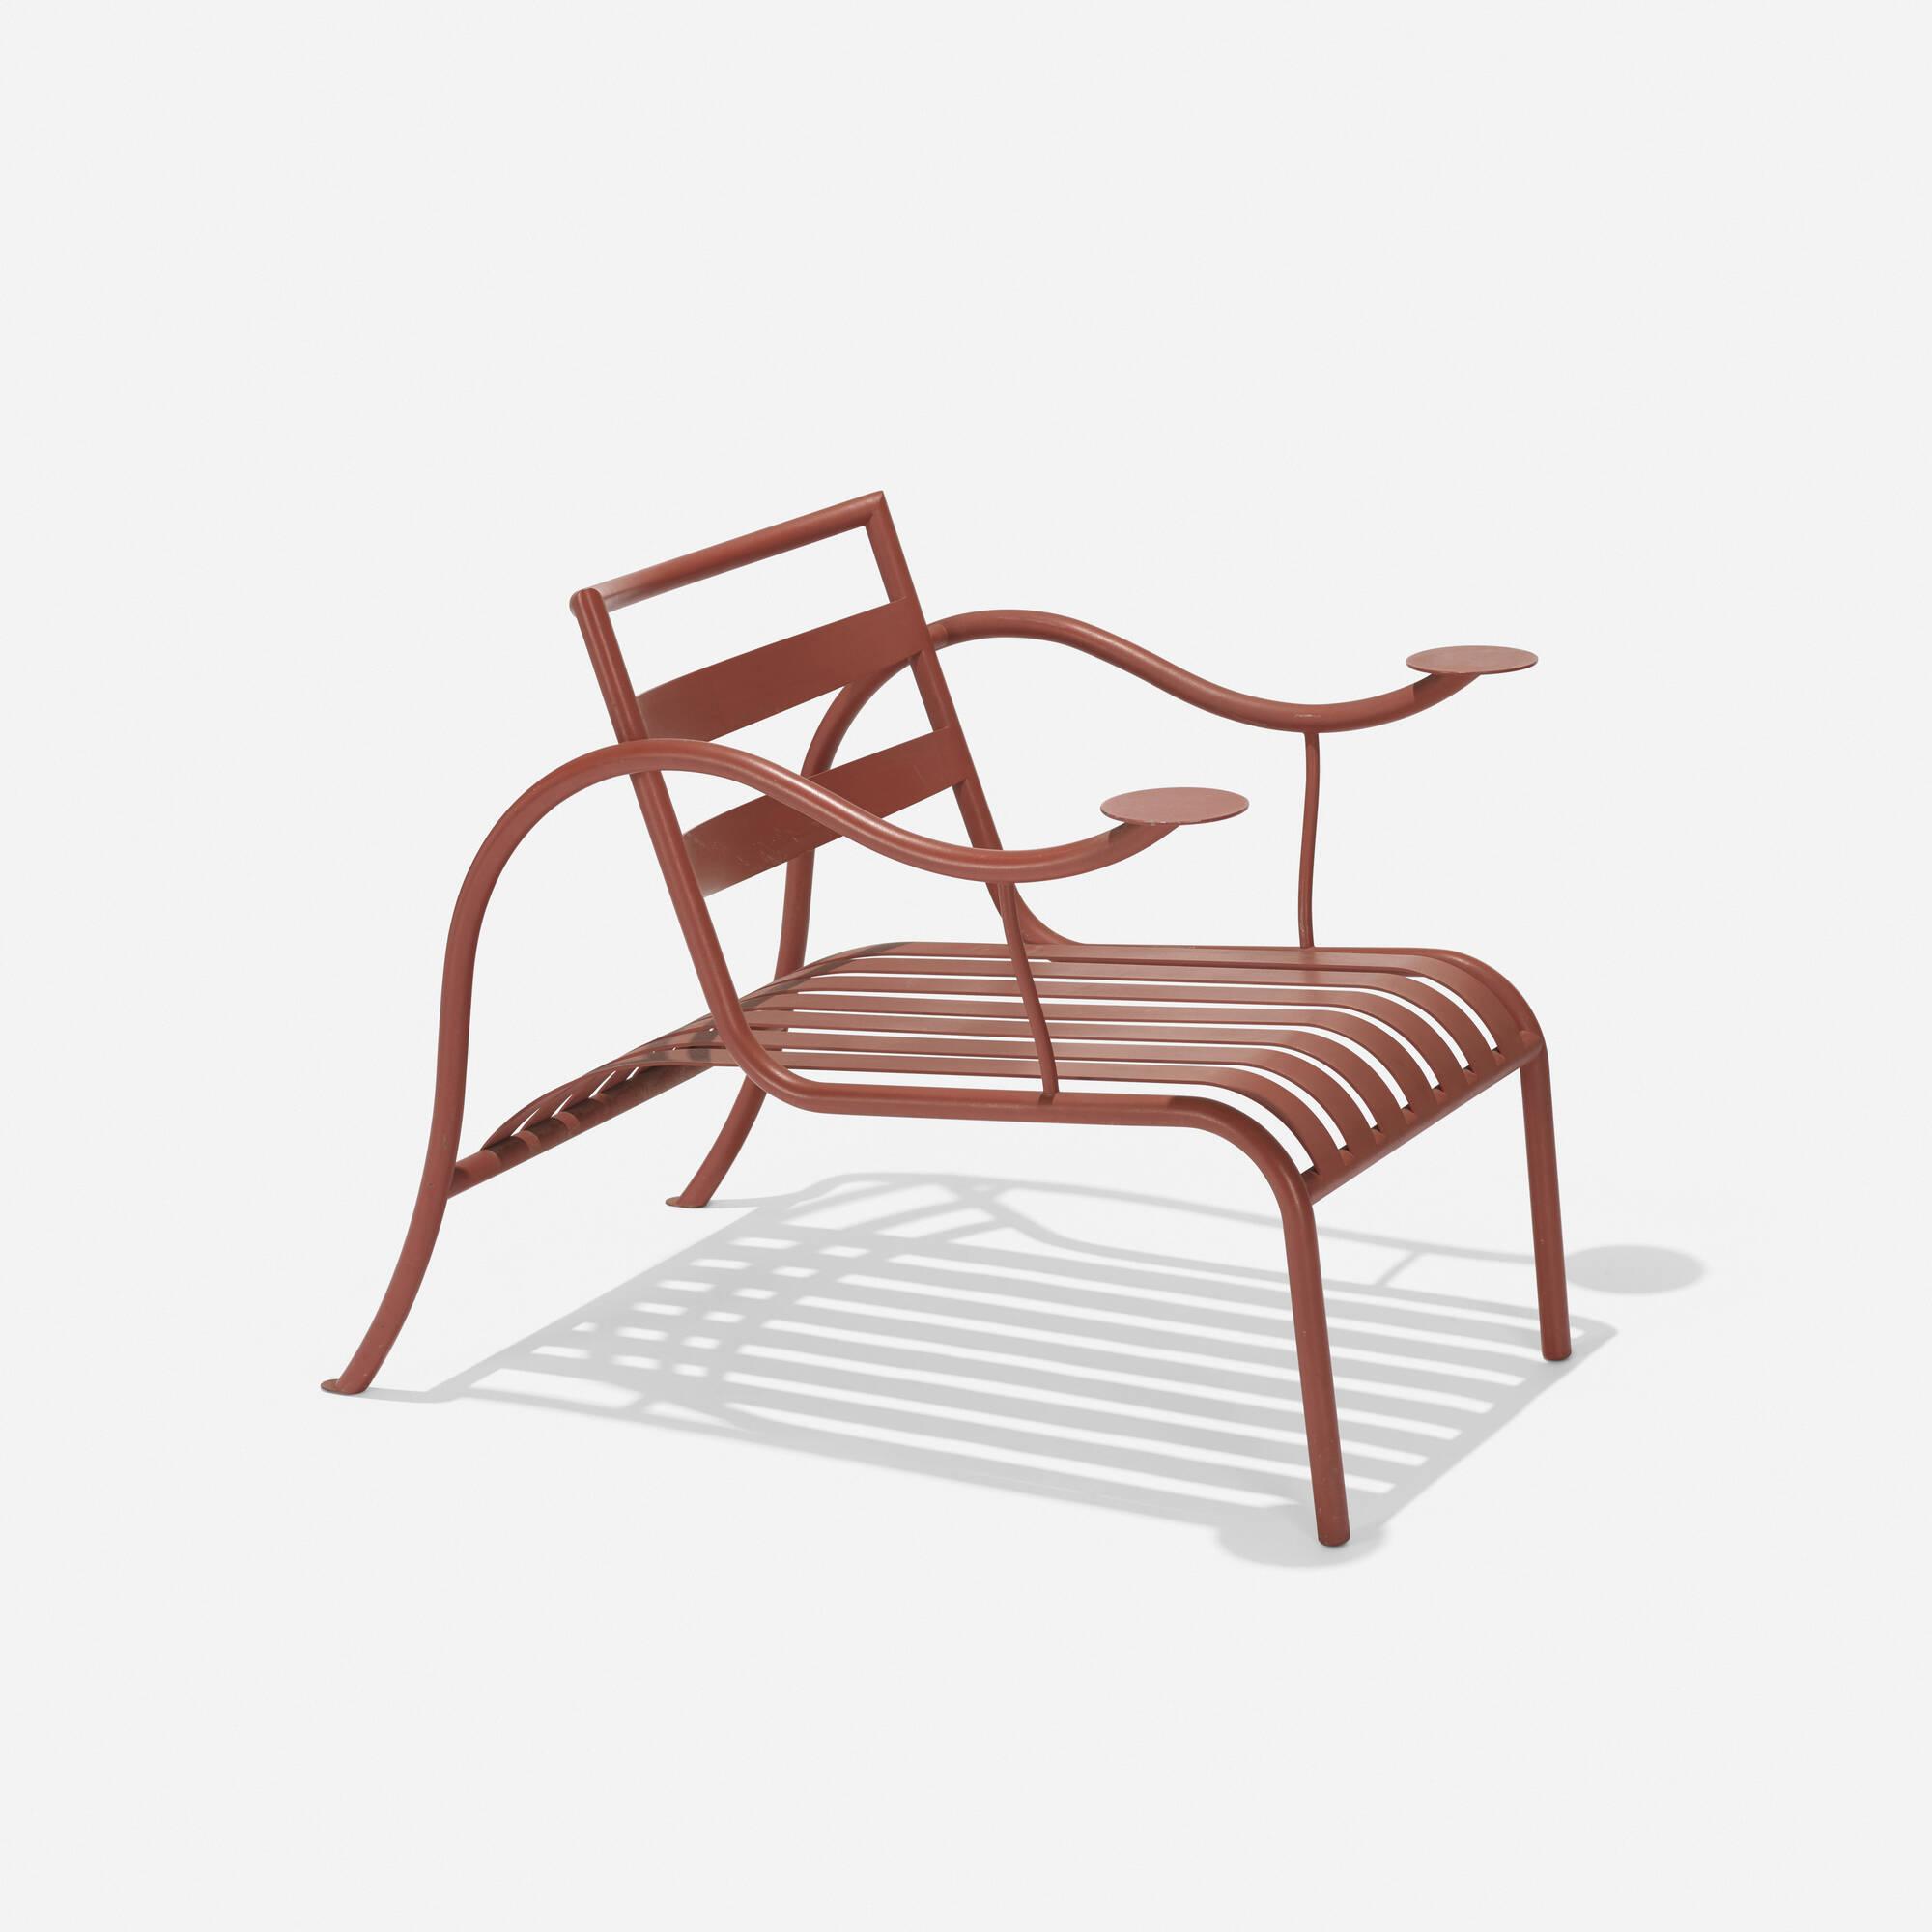 339: Jasper Morrison / Thinking man's chair (1 of 2)